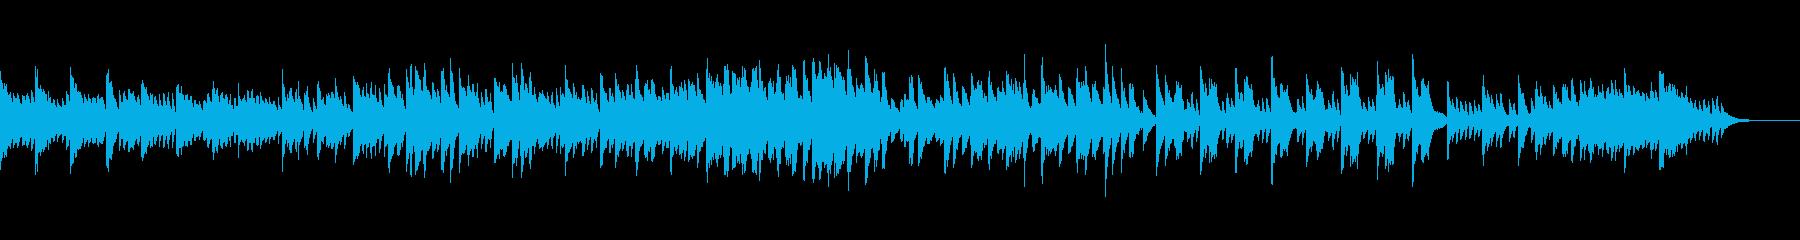 Alive(Piano solo)の再生済みの波形